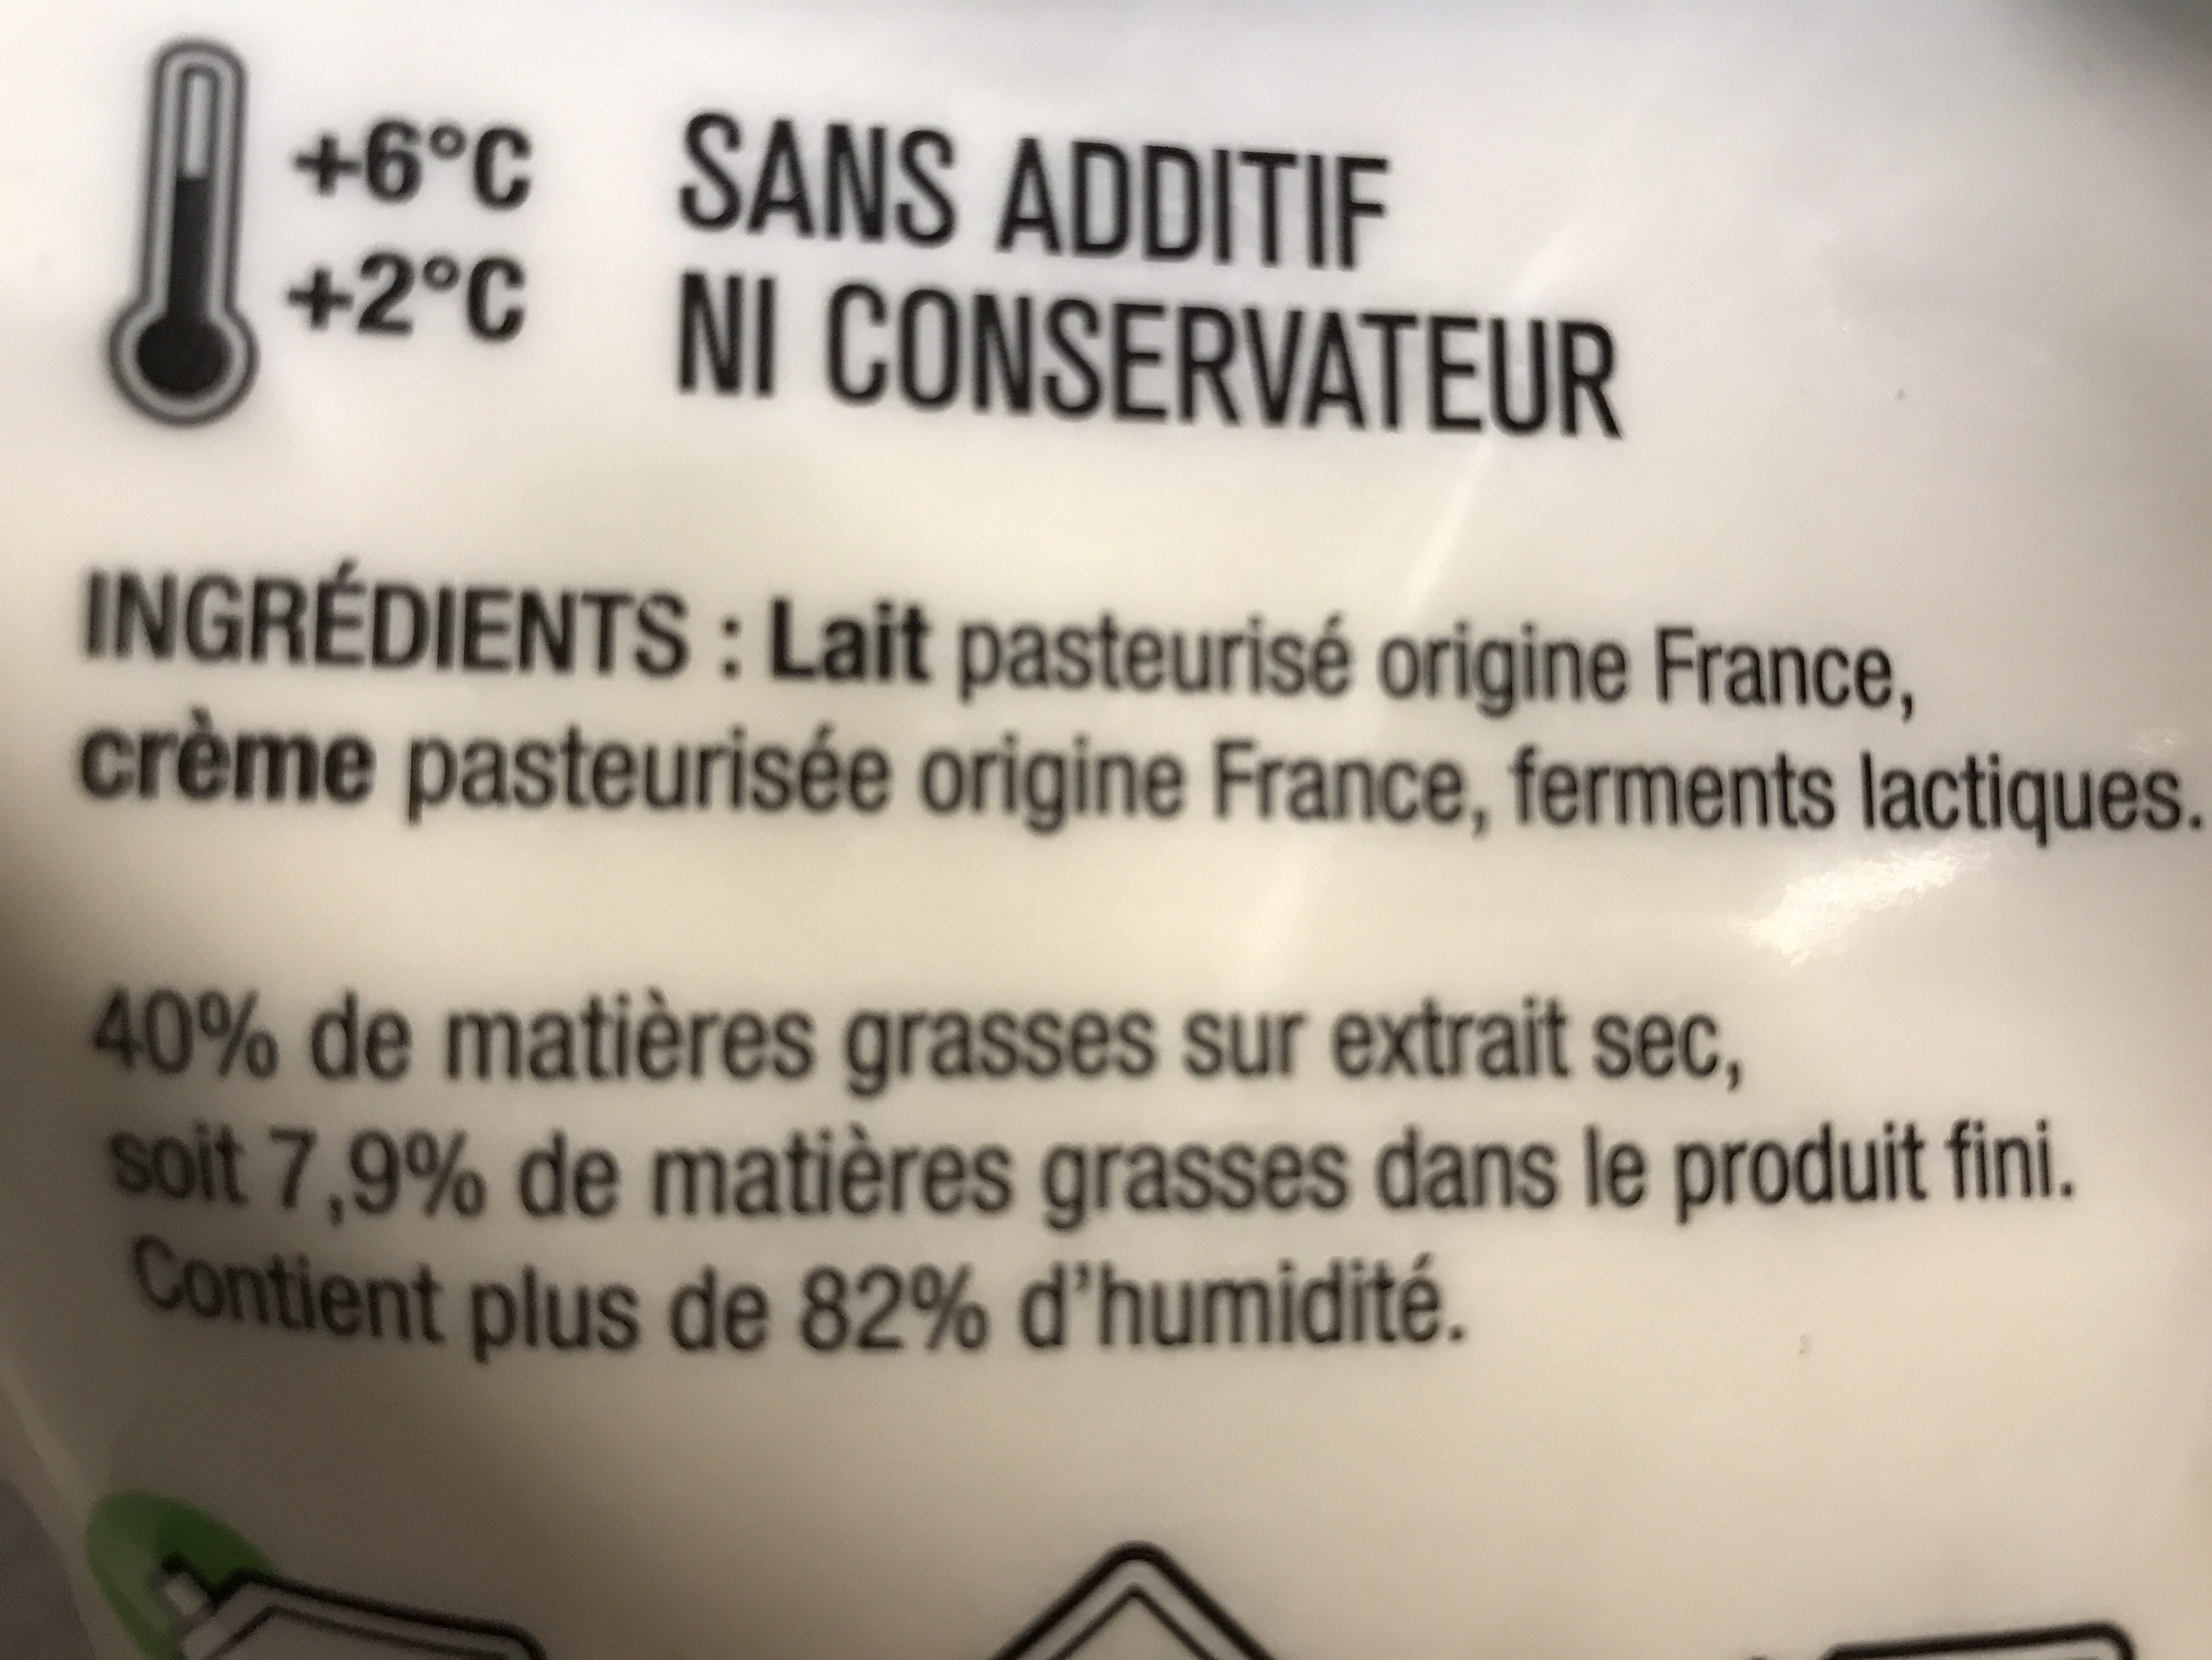 Le fromage blanc des limousins - Ingrediënten - fr